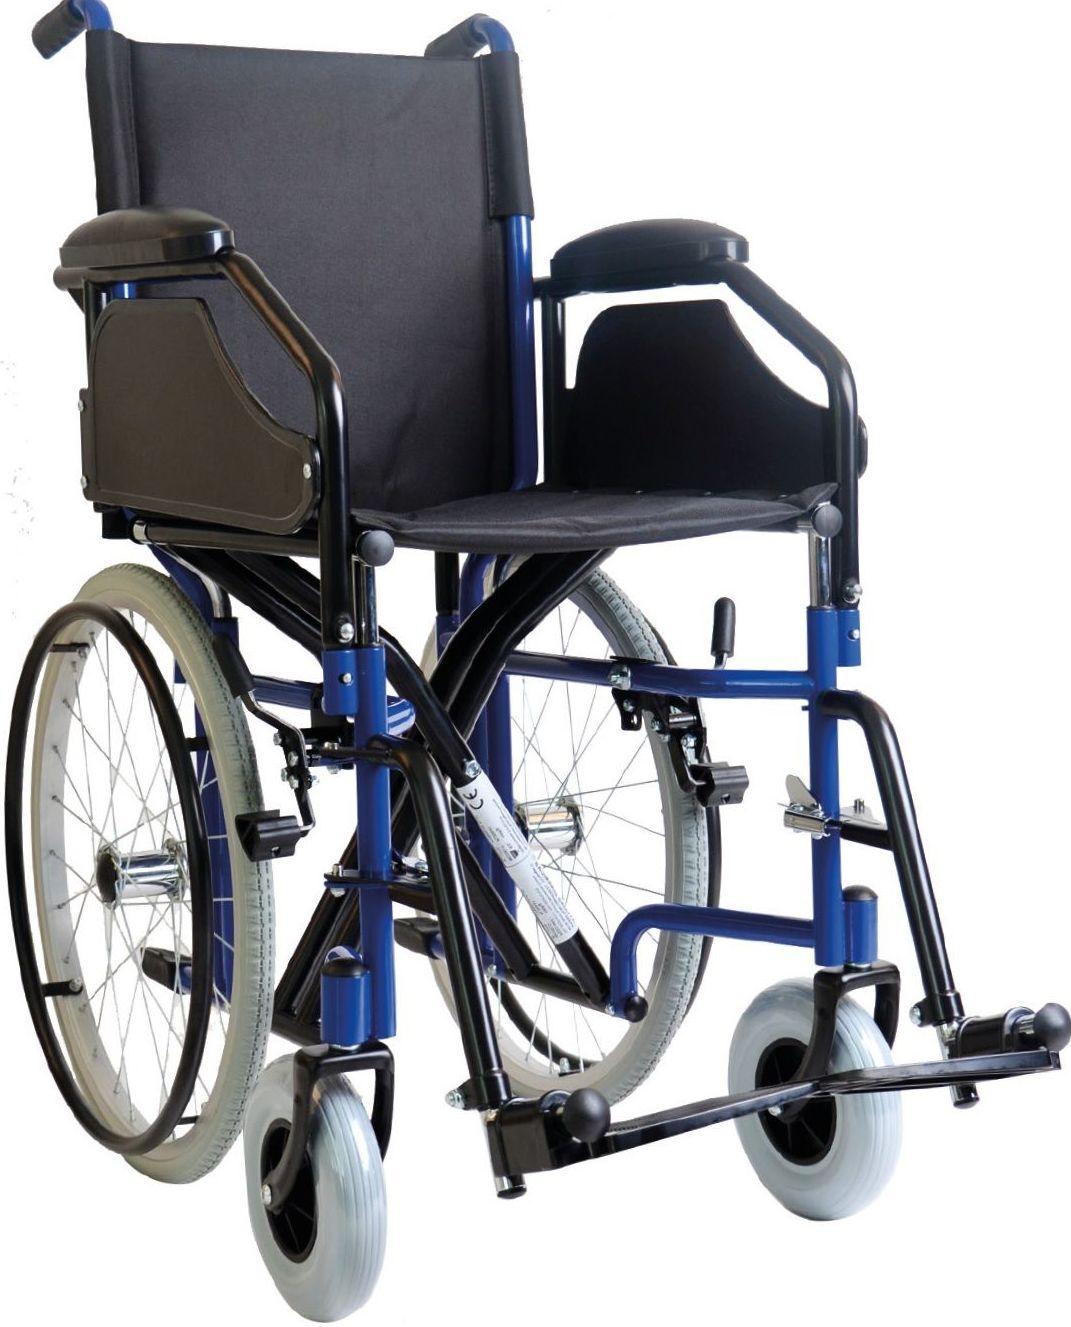 silla de ruedas alquiler barcelona